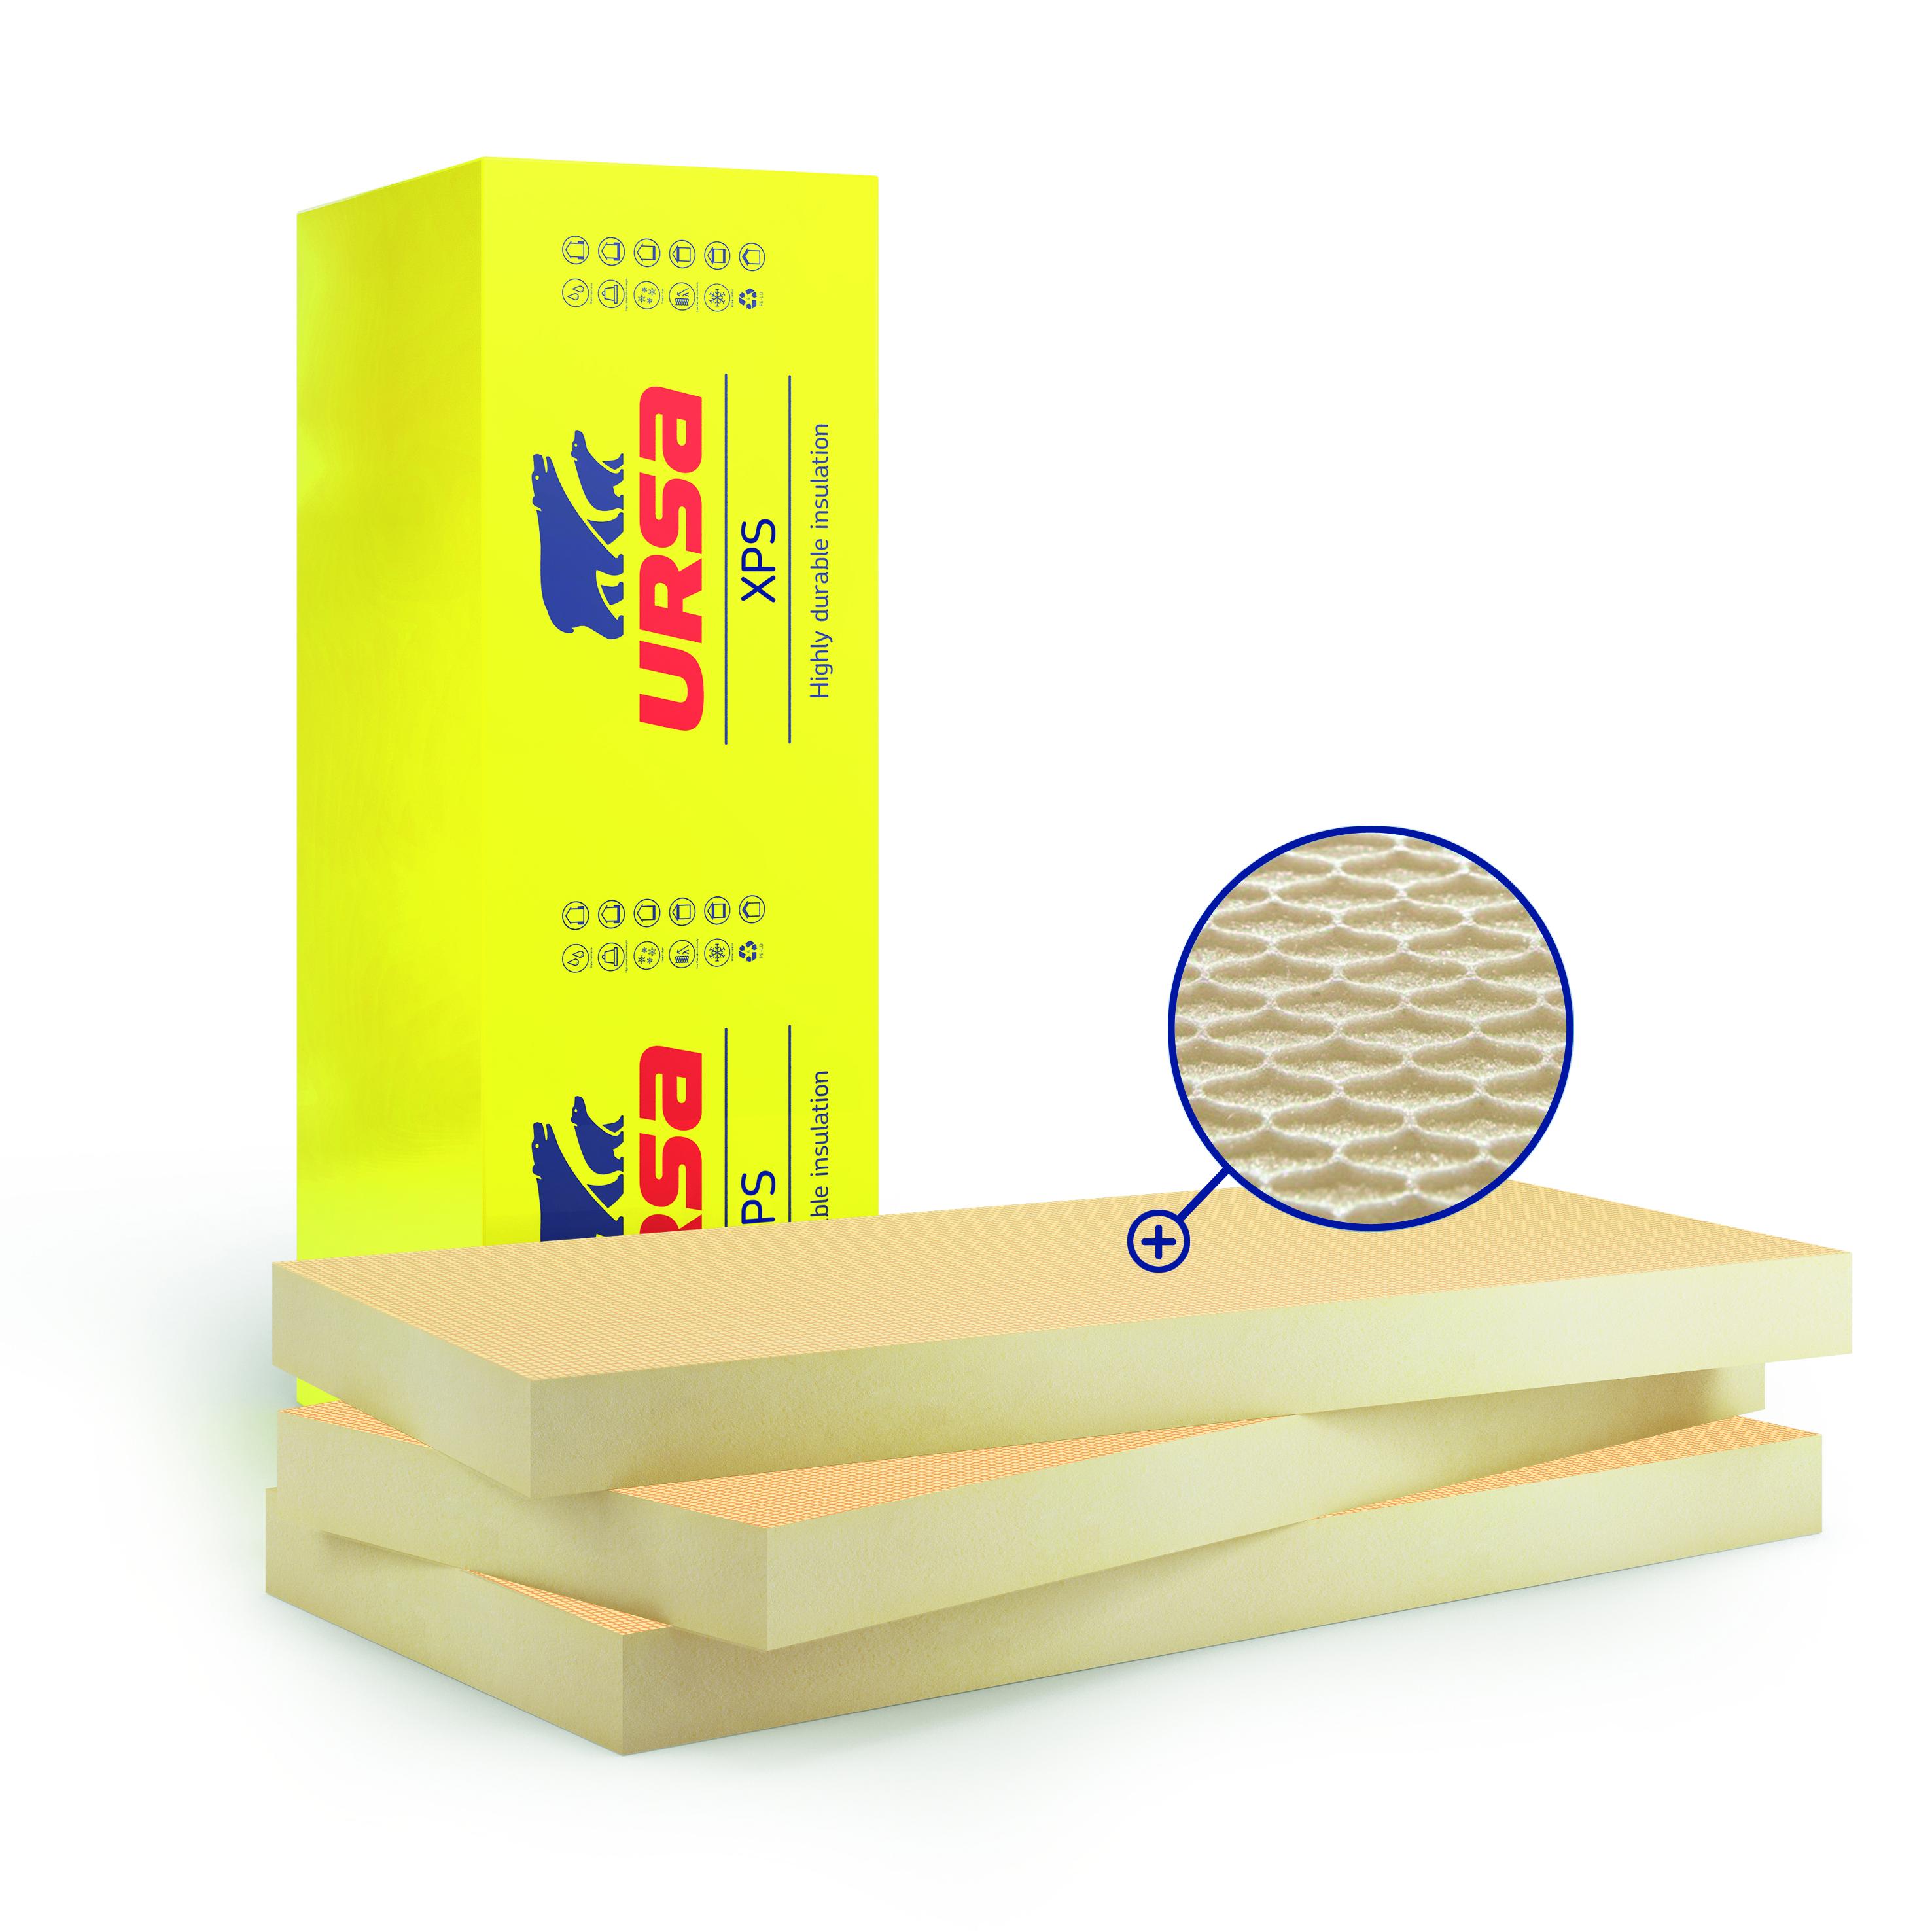 ursa-plus-1520854379.jpg